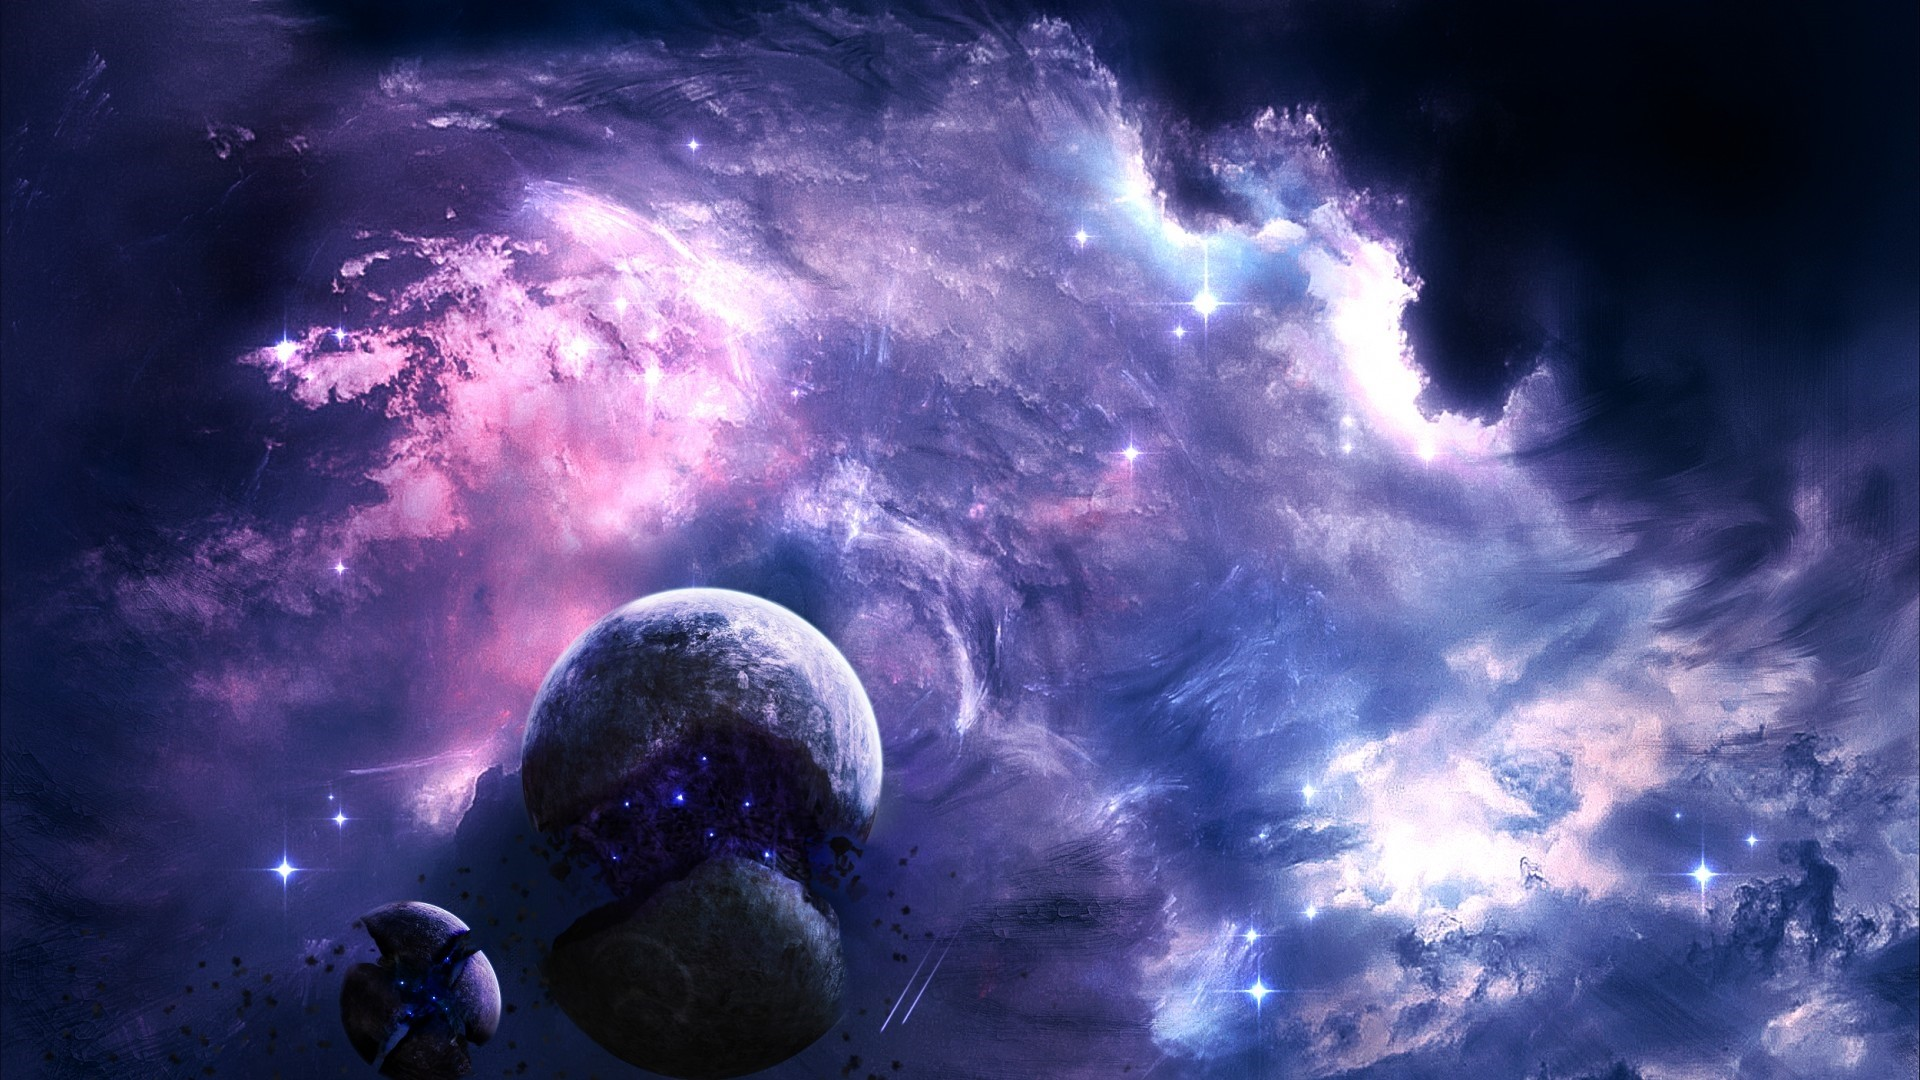 Outer Space Desktop wallpaper